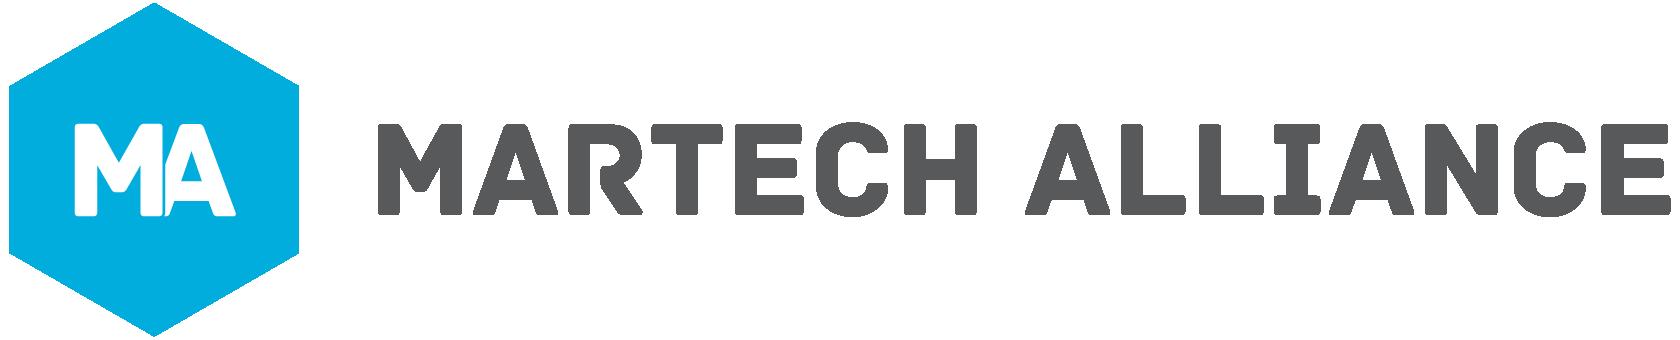 Martech Alliance - Logos_5.0 Landscape Logo copy-1